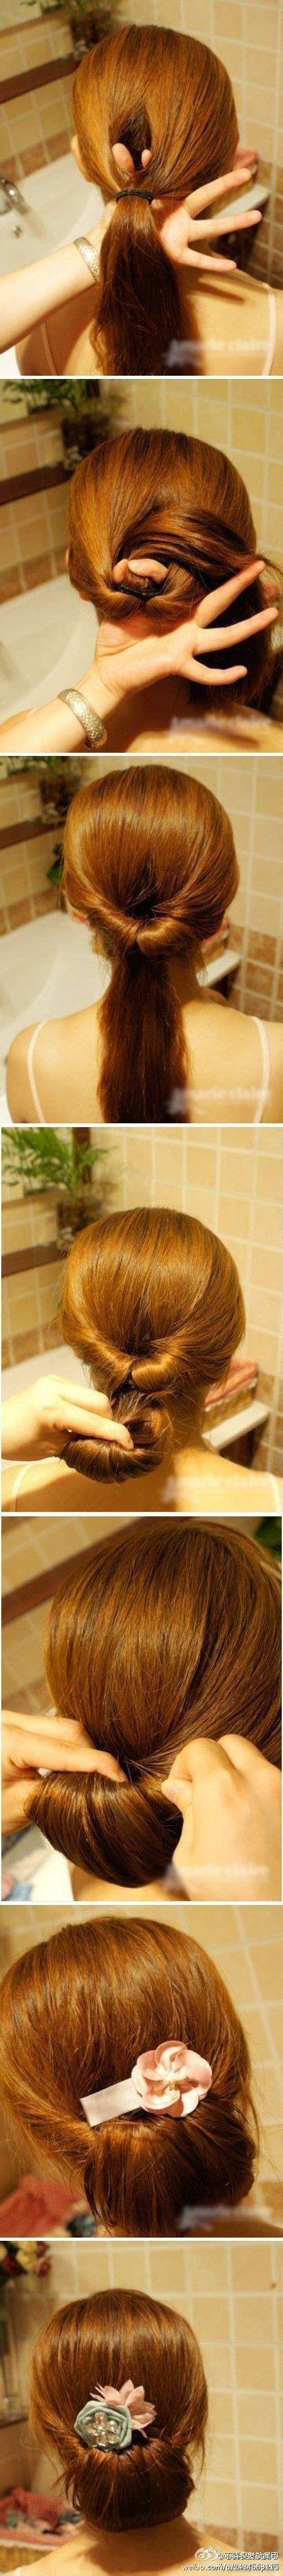 Step By Step Hairstyles For Medium Length Hair by 10 Amazing Step By Step Hairstyles For Medium Length Hair